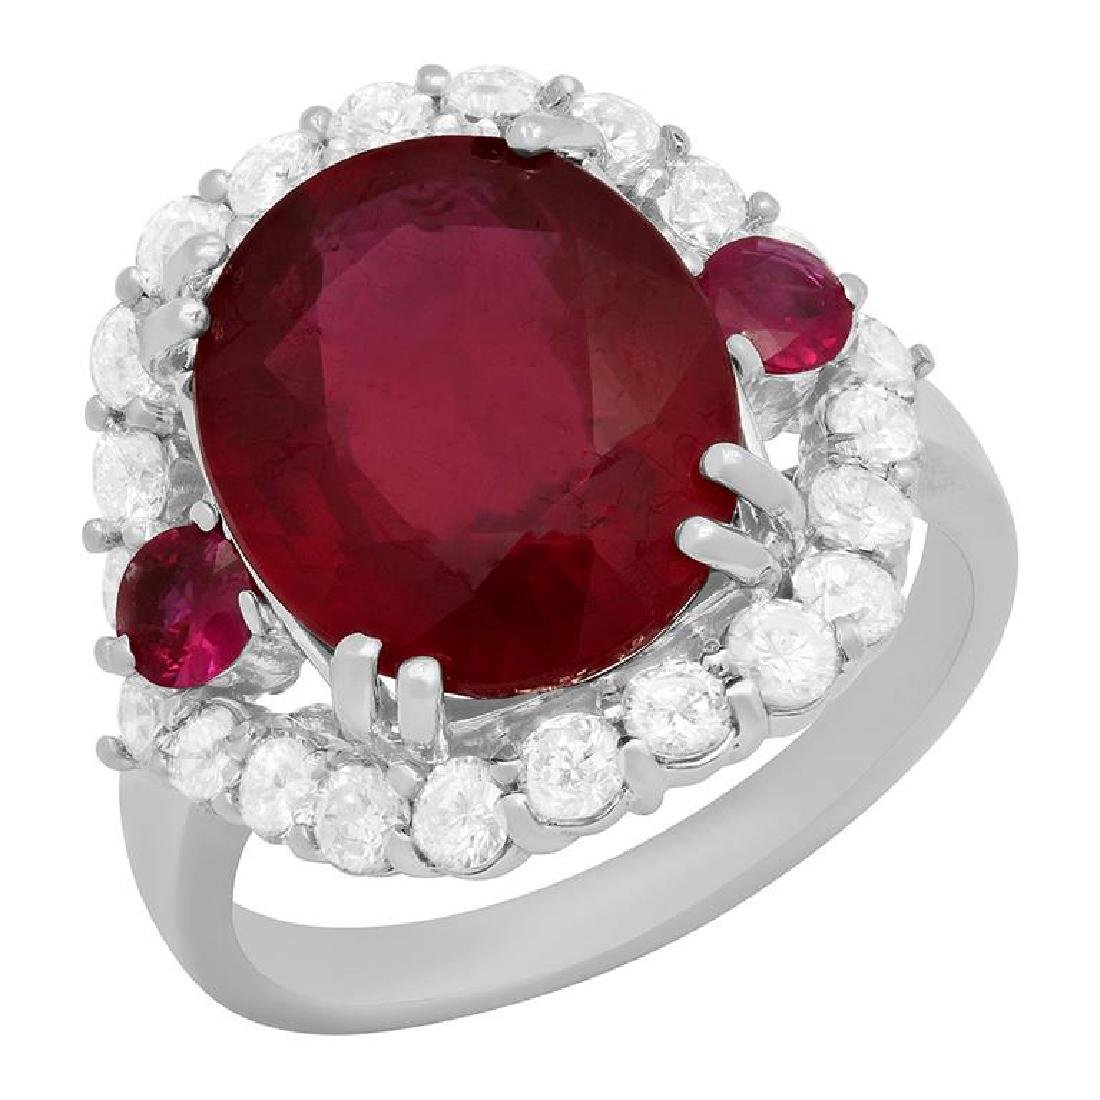 14k White Gold 7.00ct & 0.40ct Ruby 1.22ct Diamond Ring